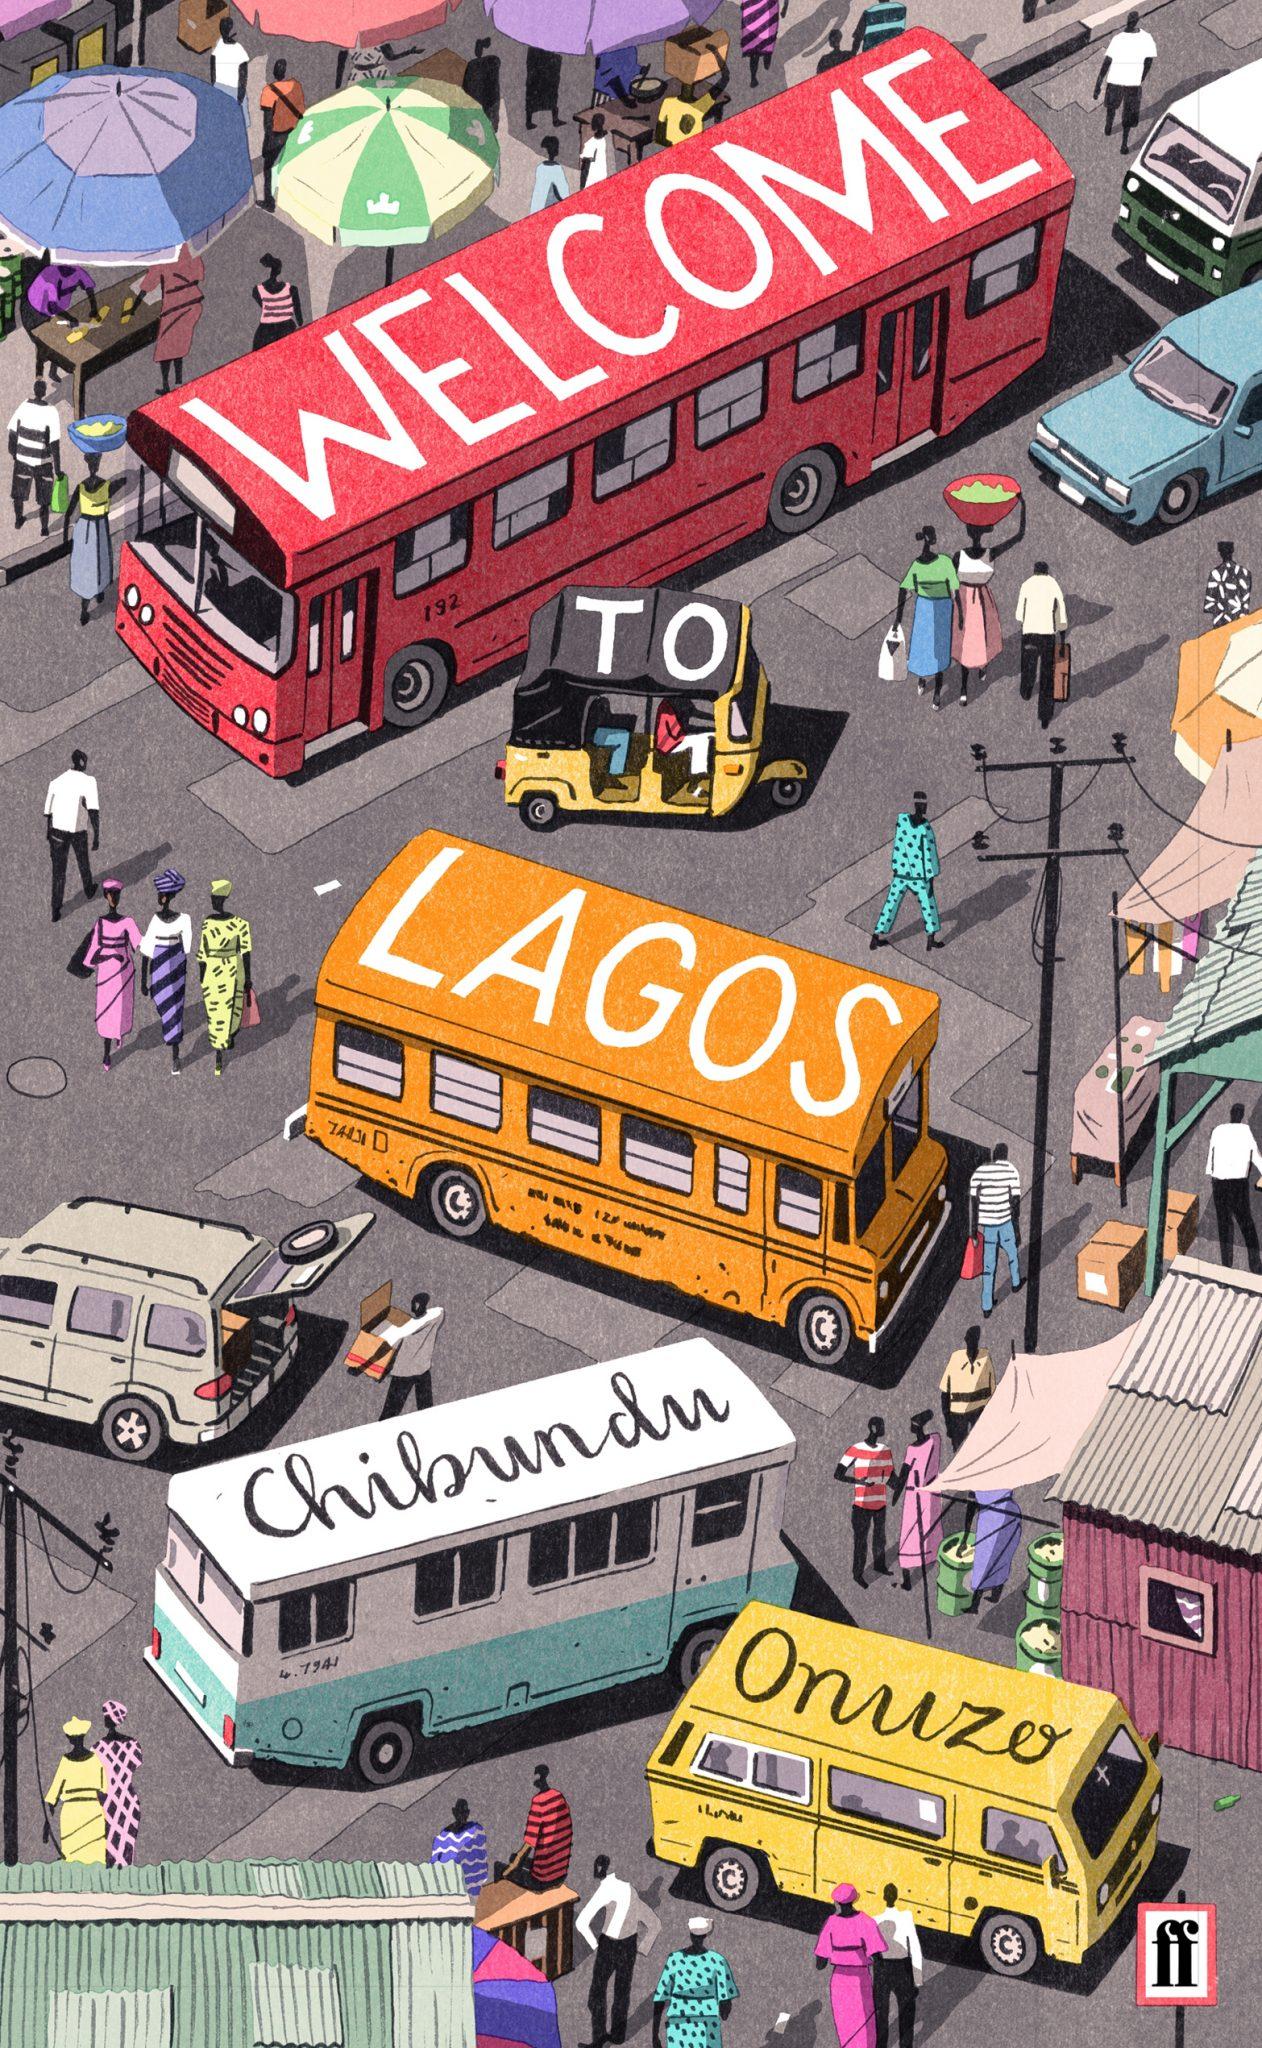 Book of the week: Welcome to Lagos, by Chibundu Onuzo